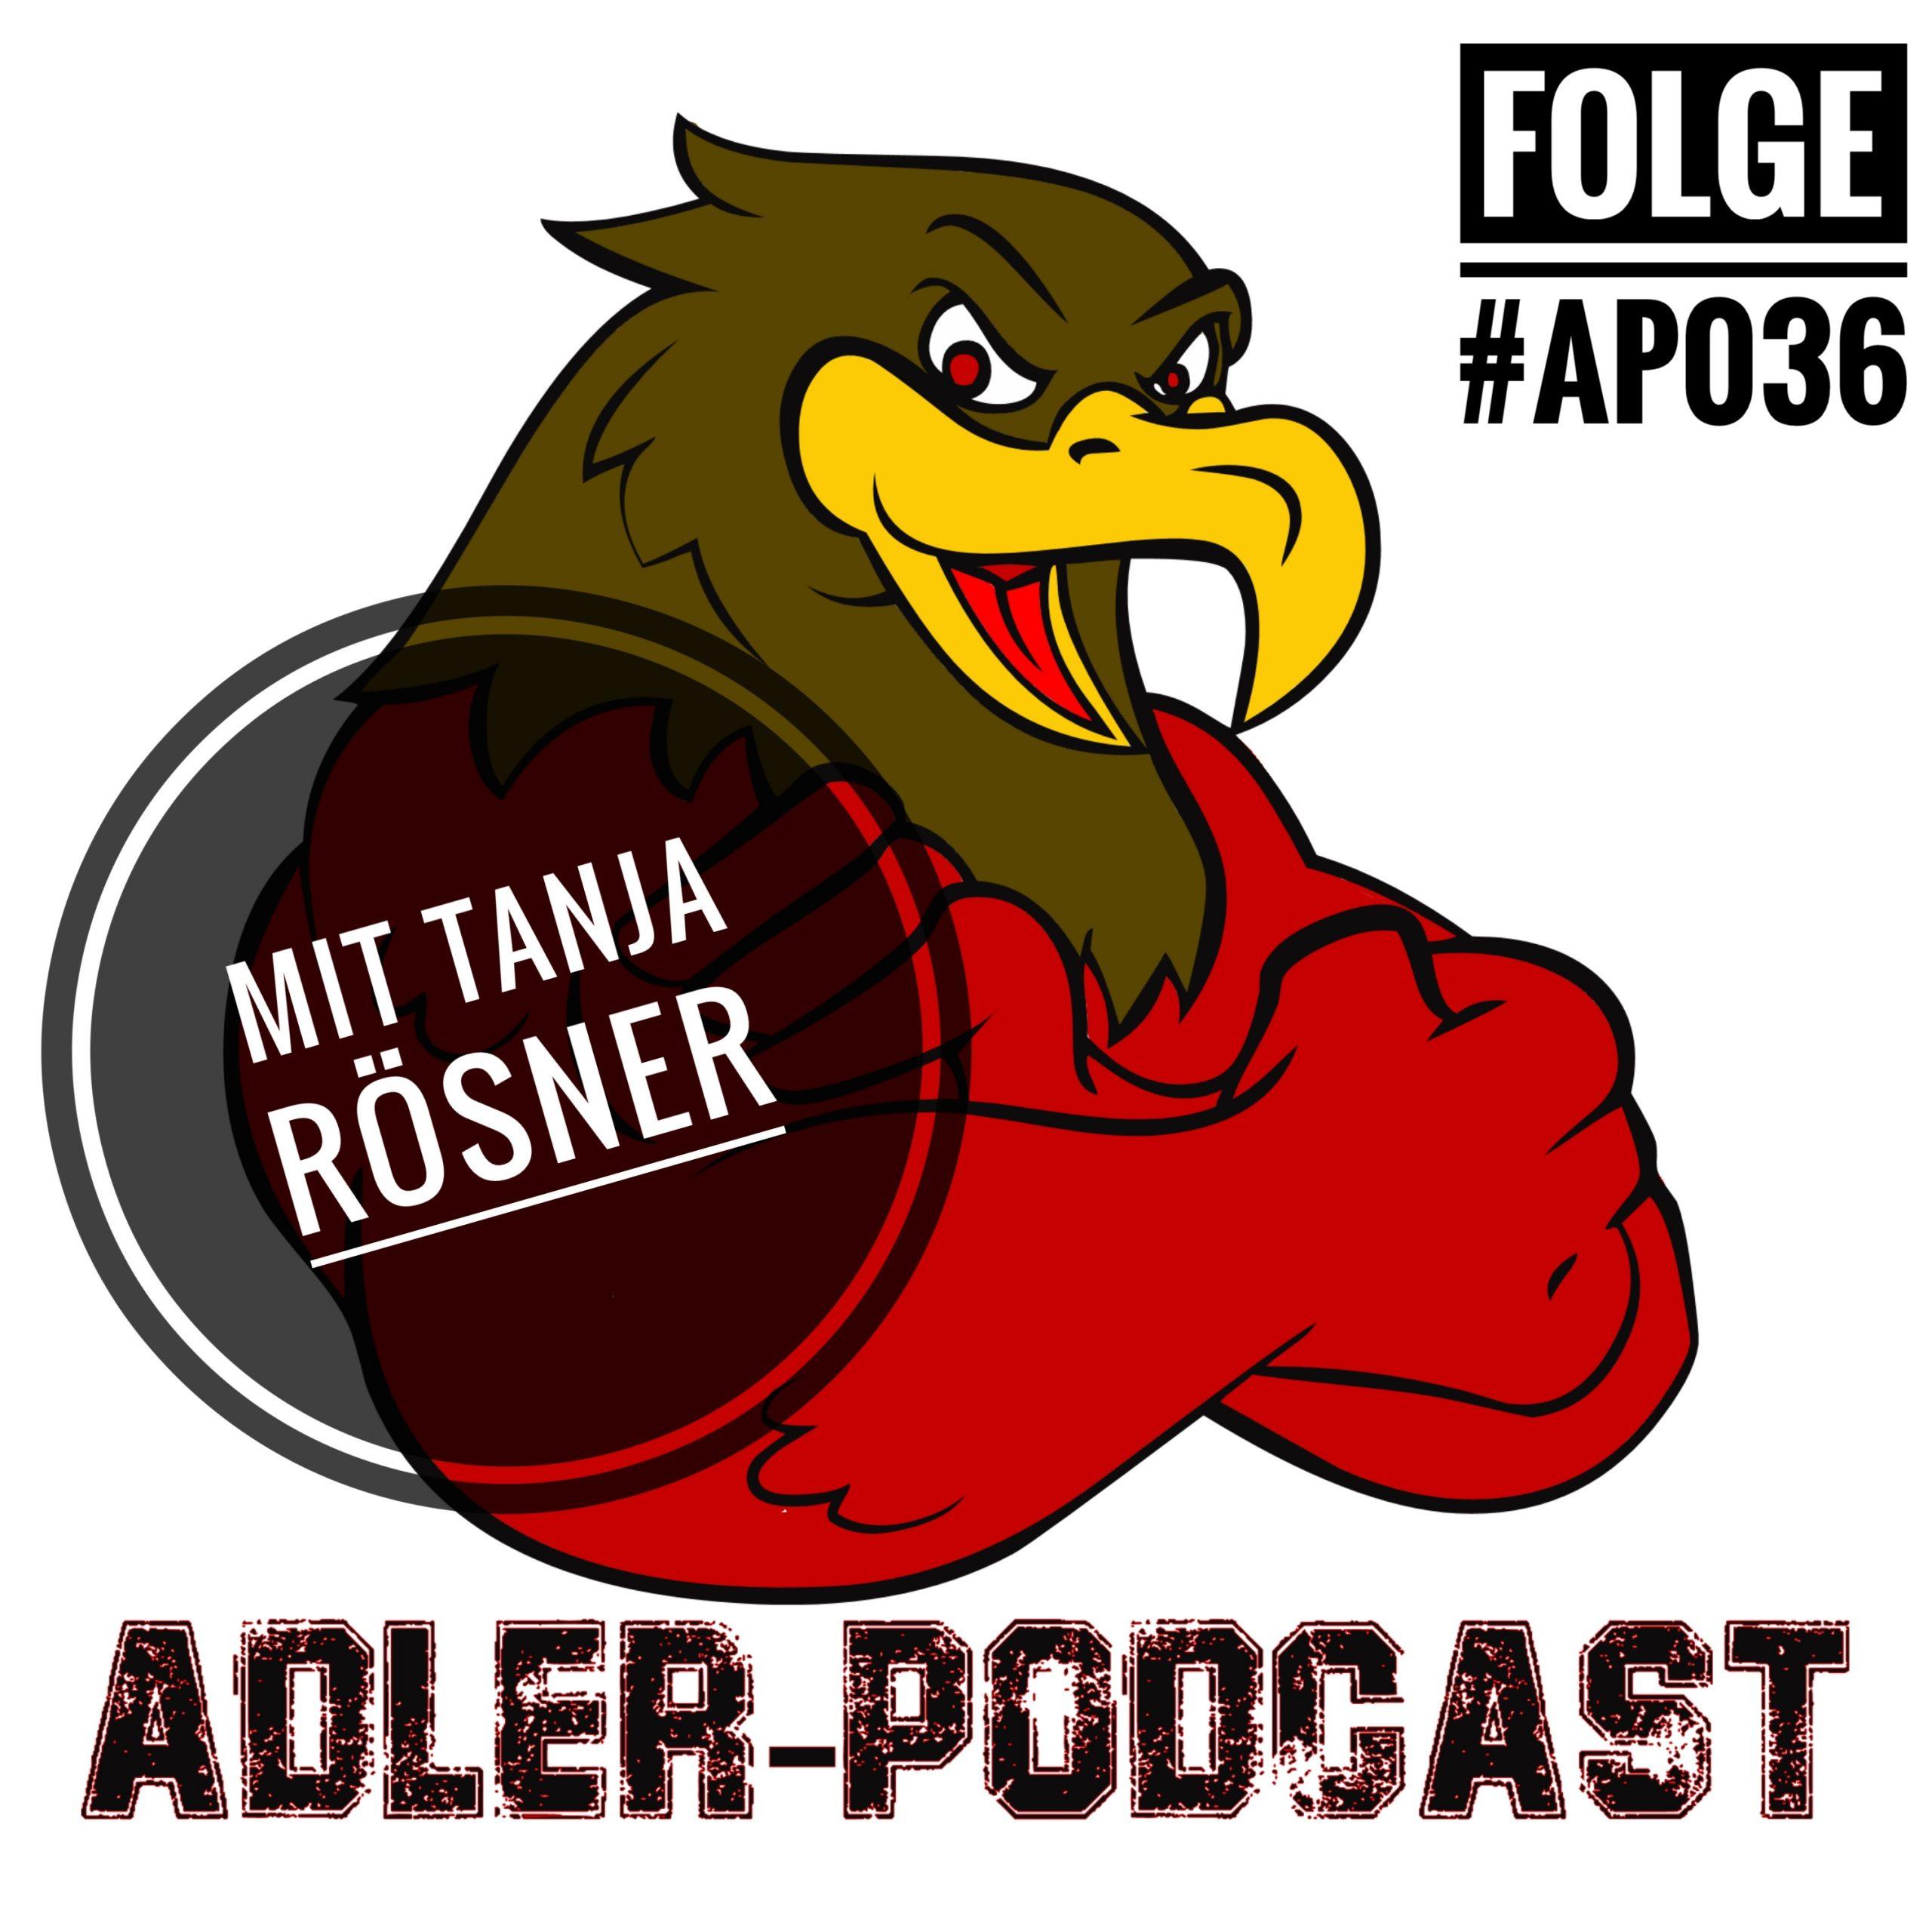 #AP036 - Adler-Podcast meets: Tanja Rösner